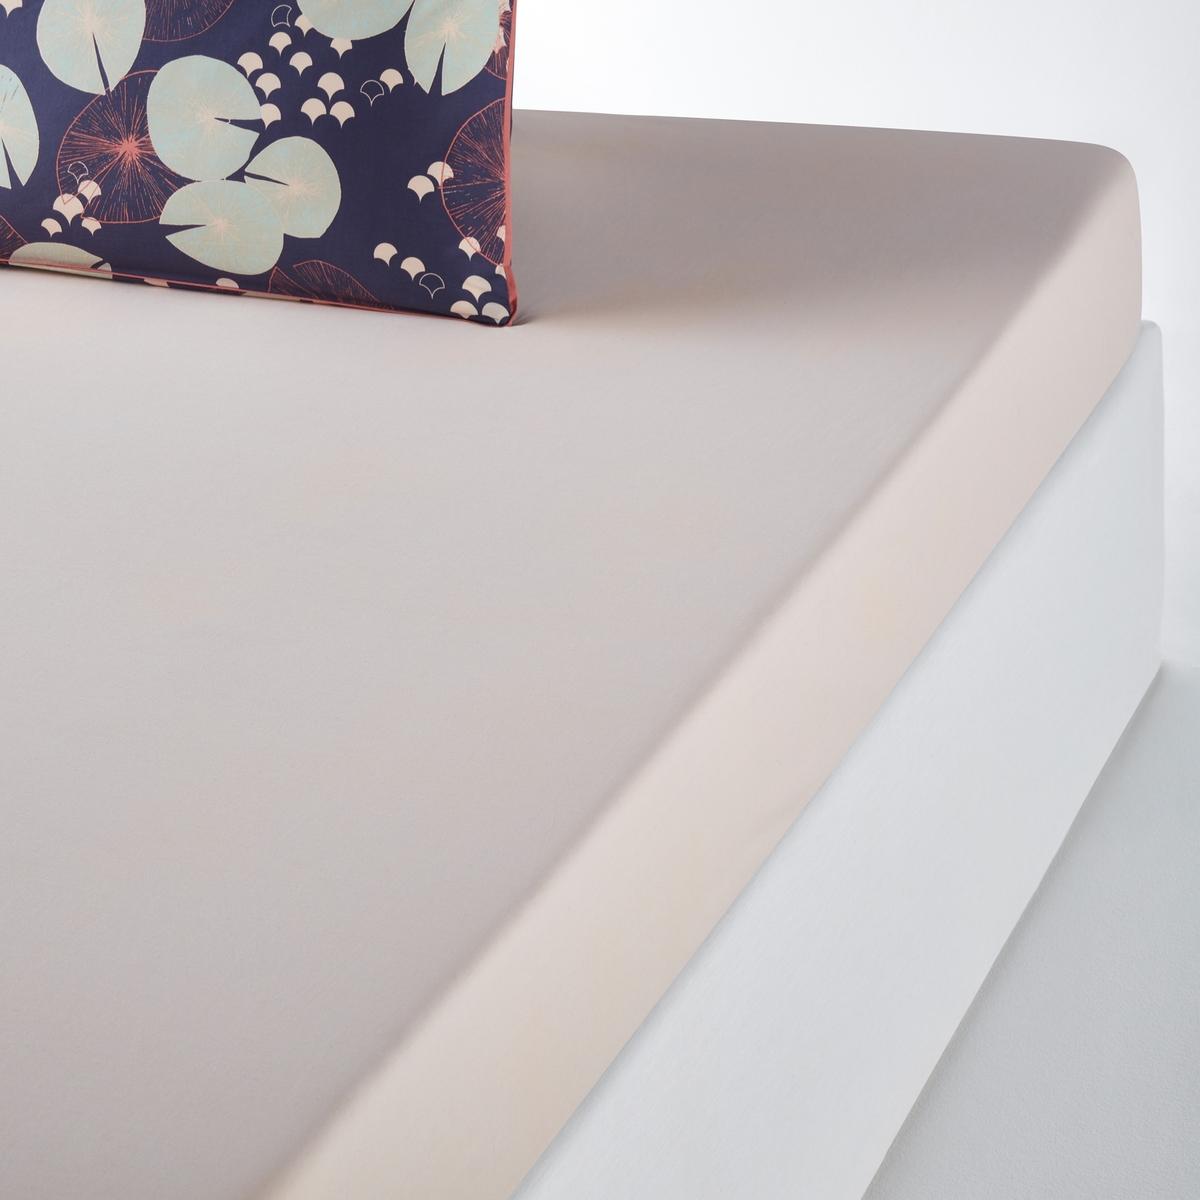 Lençol-capa, percal de algodão, JARDIN D'EAU